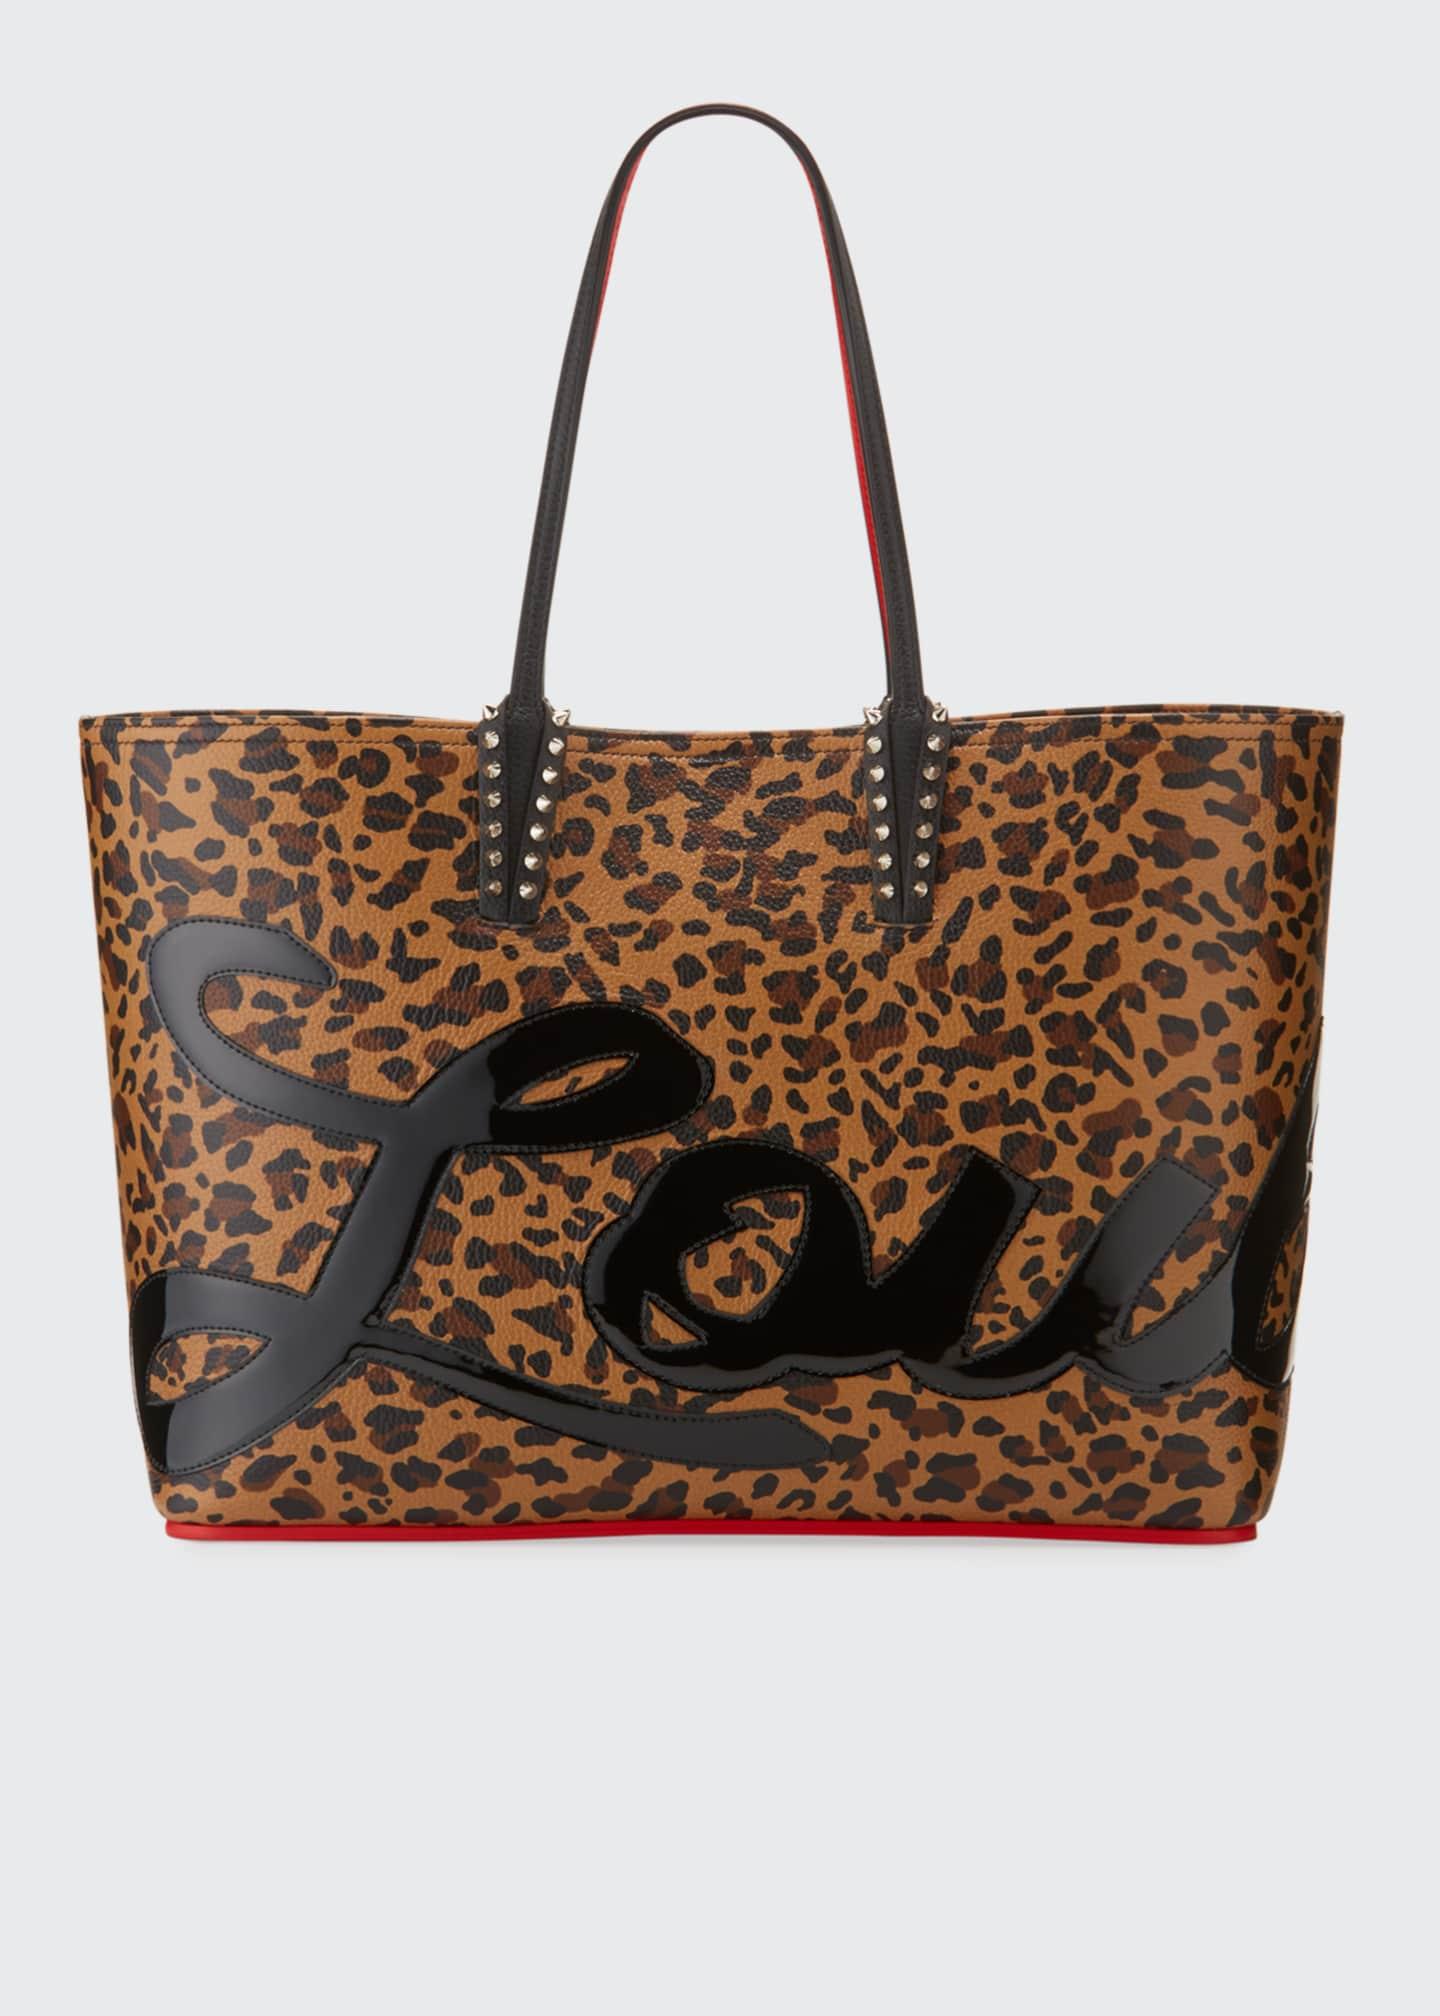 Christian Louboutin Cabata Logo Calf Empire Tote Bag